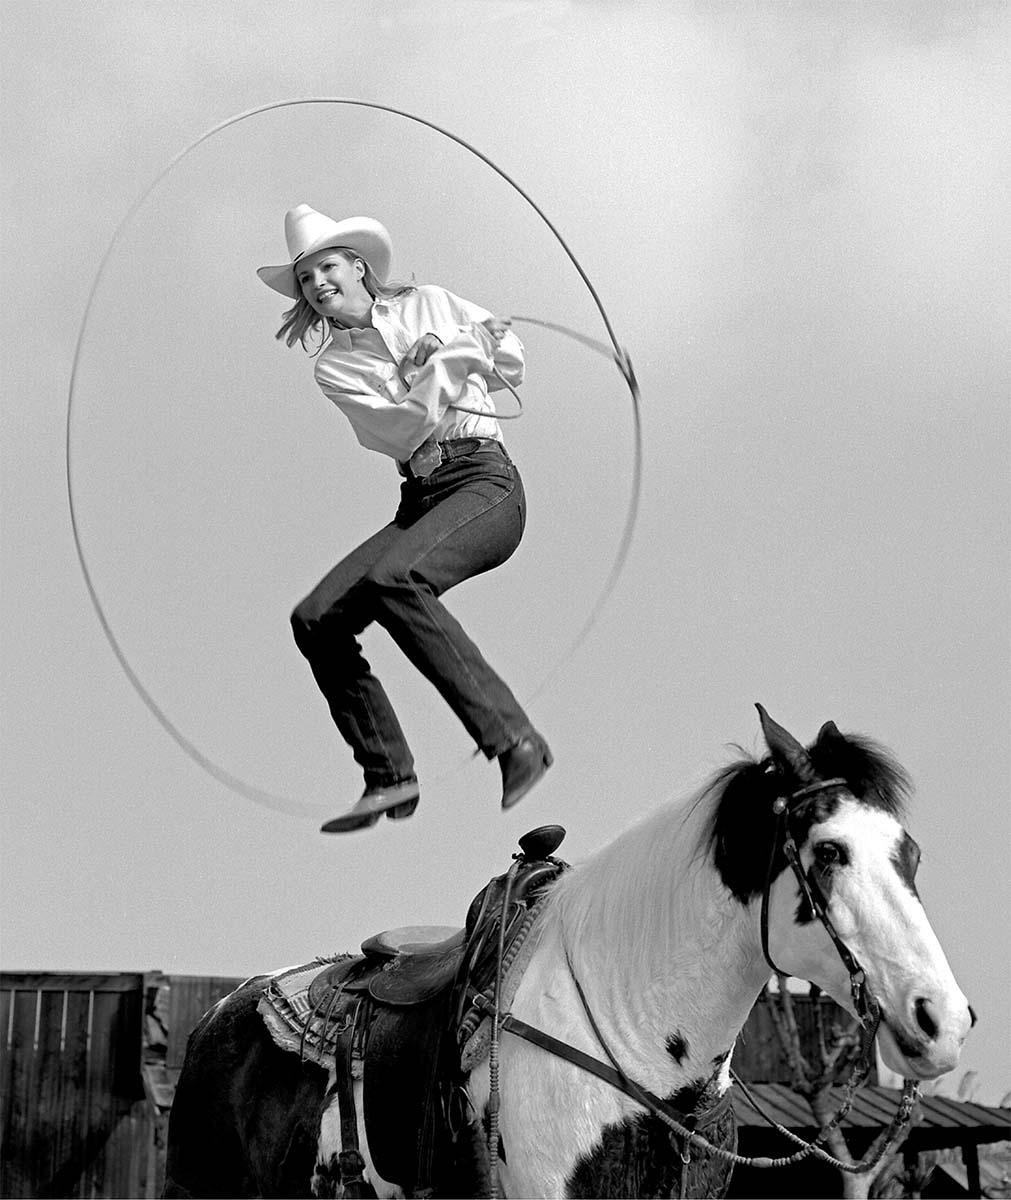 William Shepley photo. Janna Copley, Riata Ranch, Exeter, California 1995; silver gelatin print. P.602.023